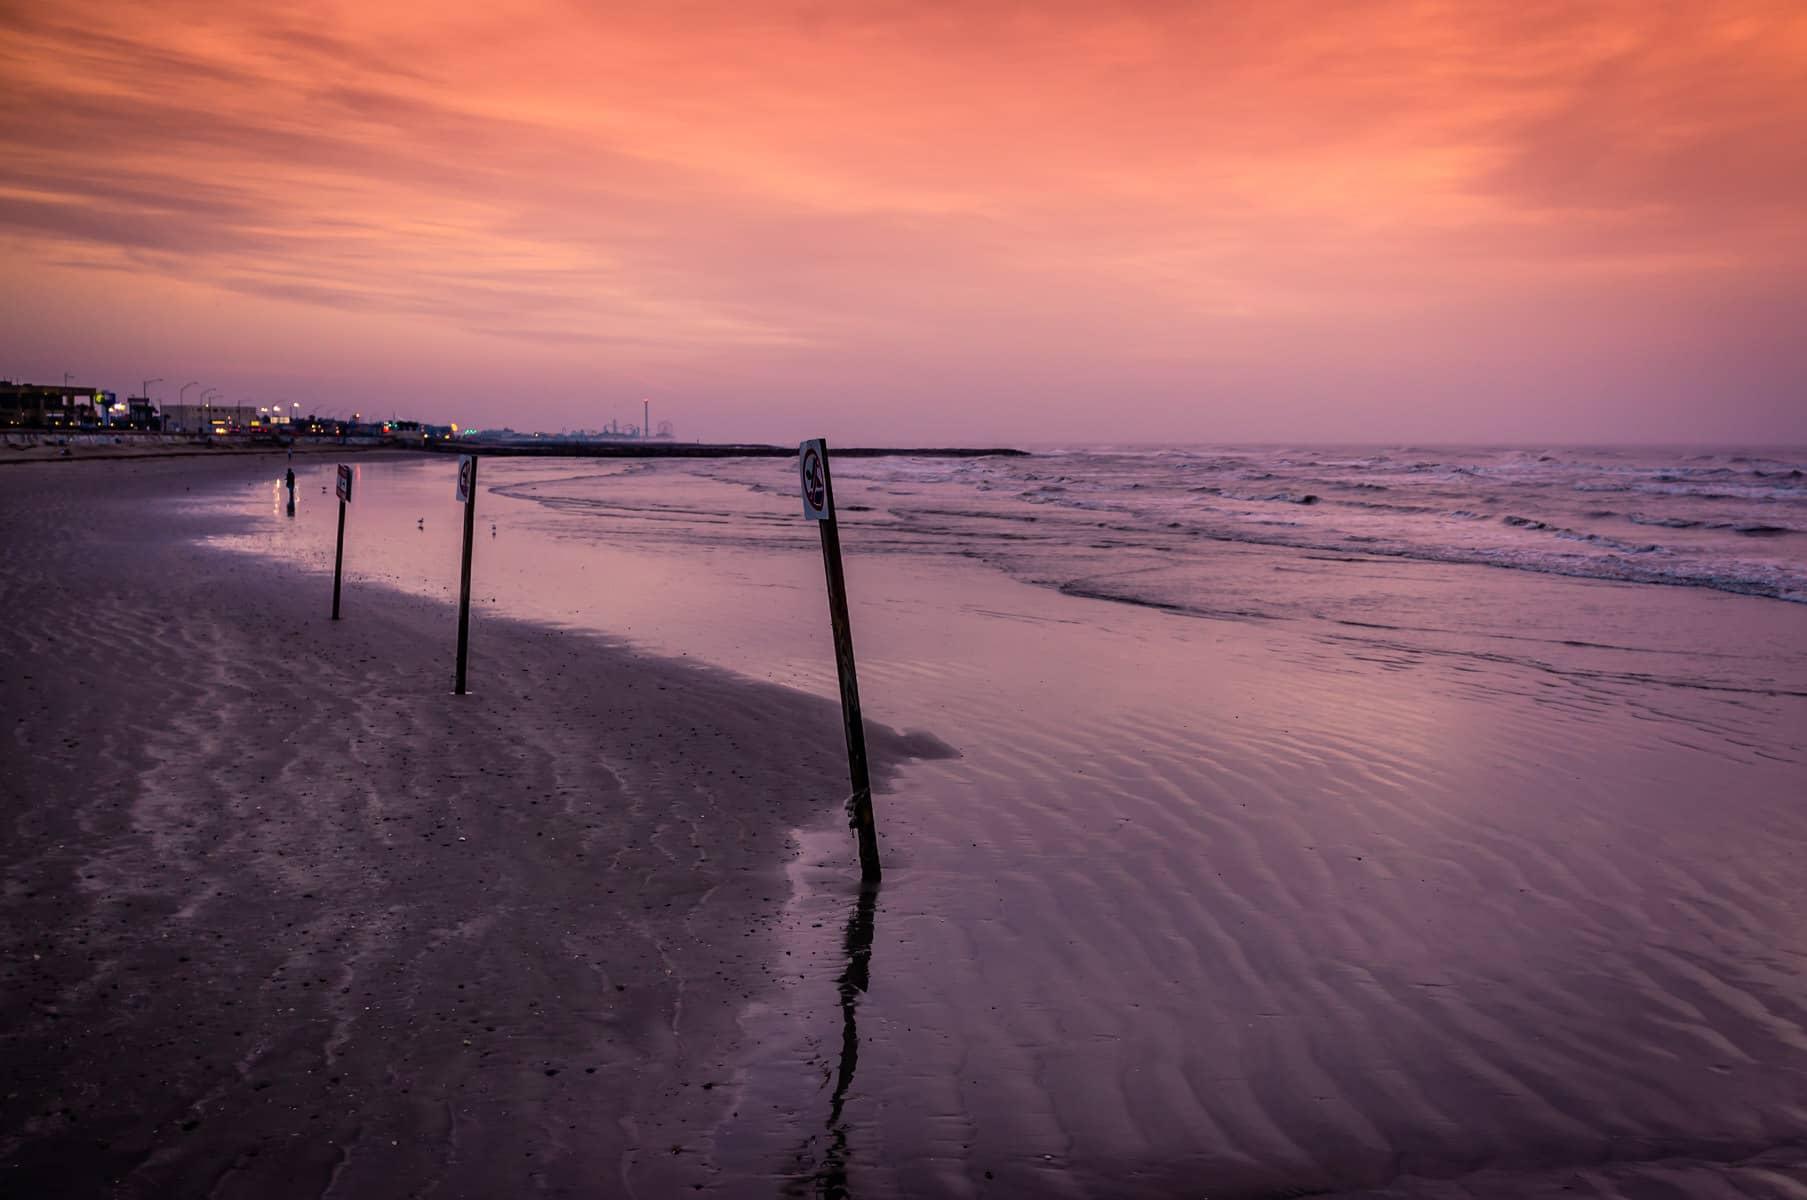 The early-morning sun begins to light up Galveston, Texas' beach on an overcast day.